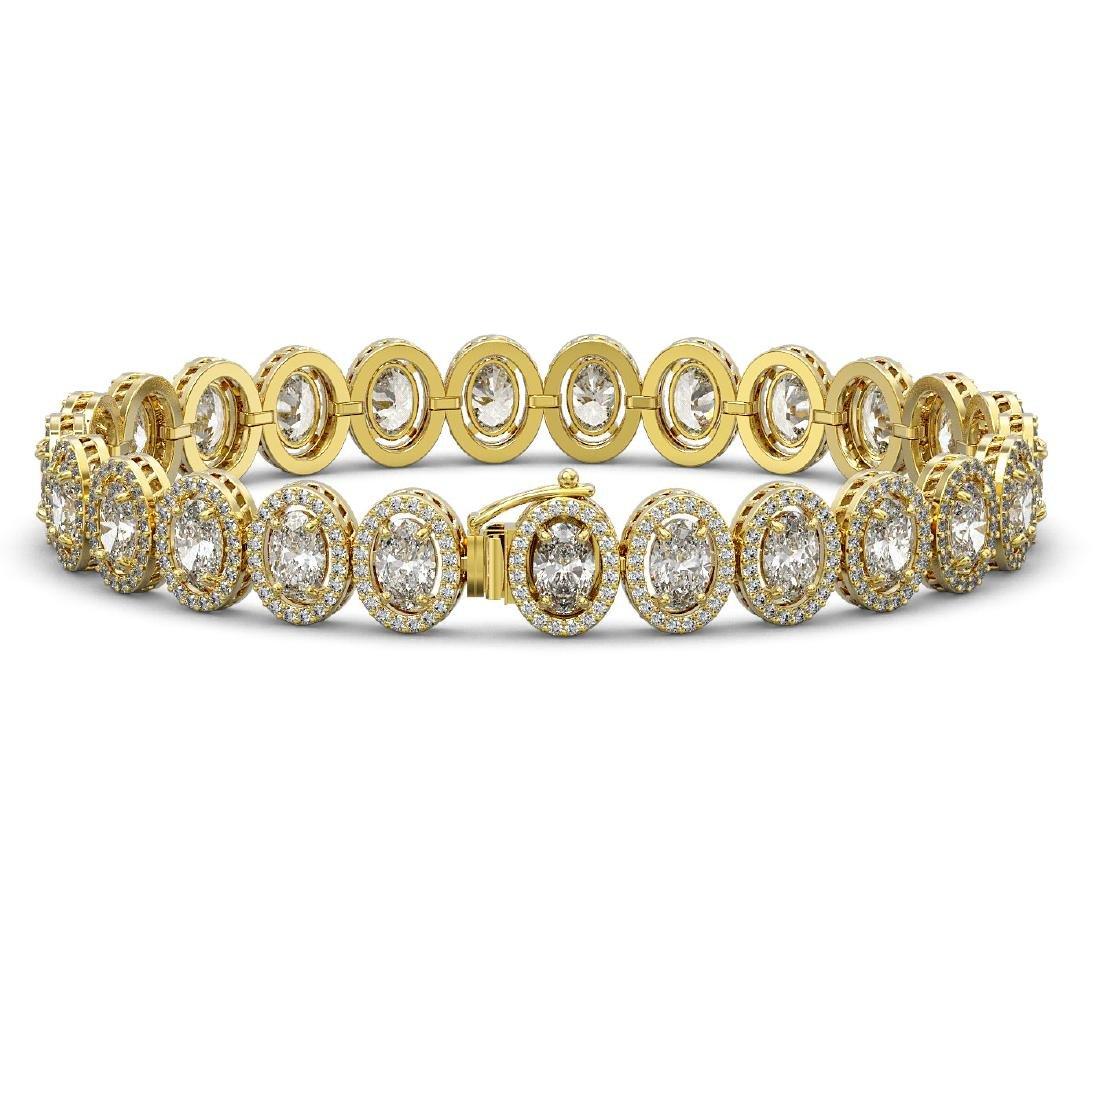 18.8 CTW Oval Diamond Designer Bracelet 18K Yellow Gold - 2